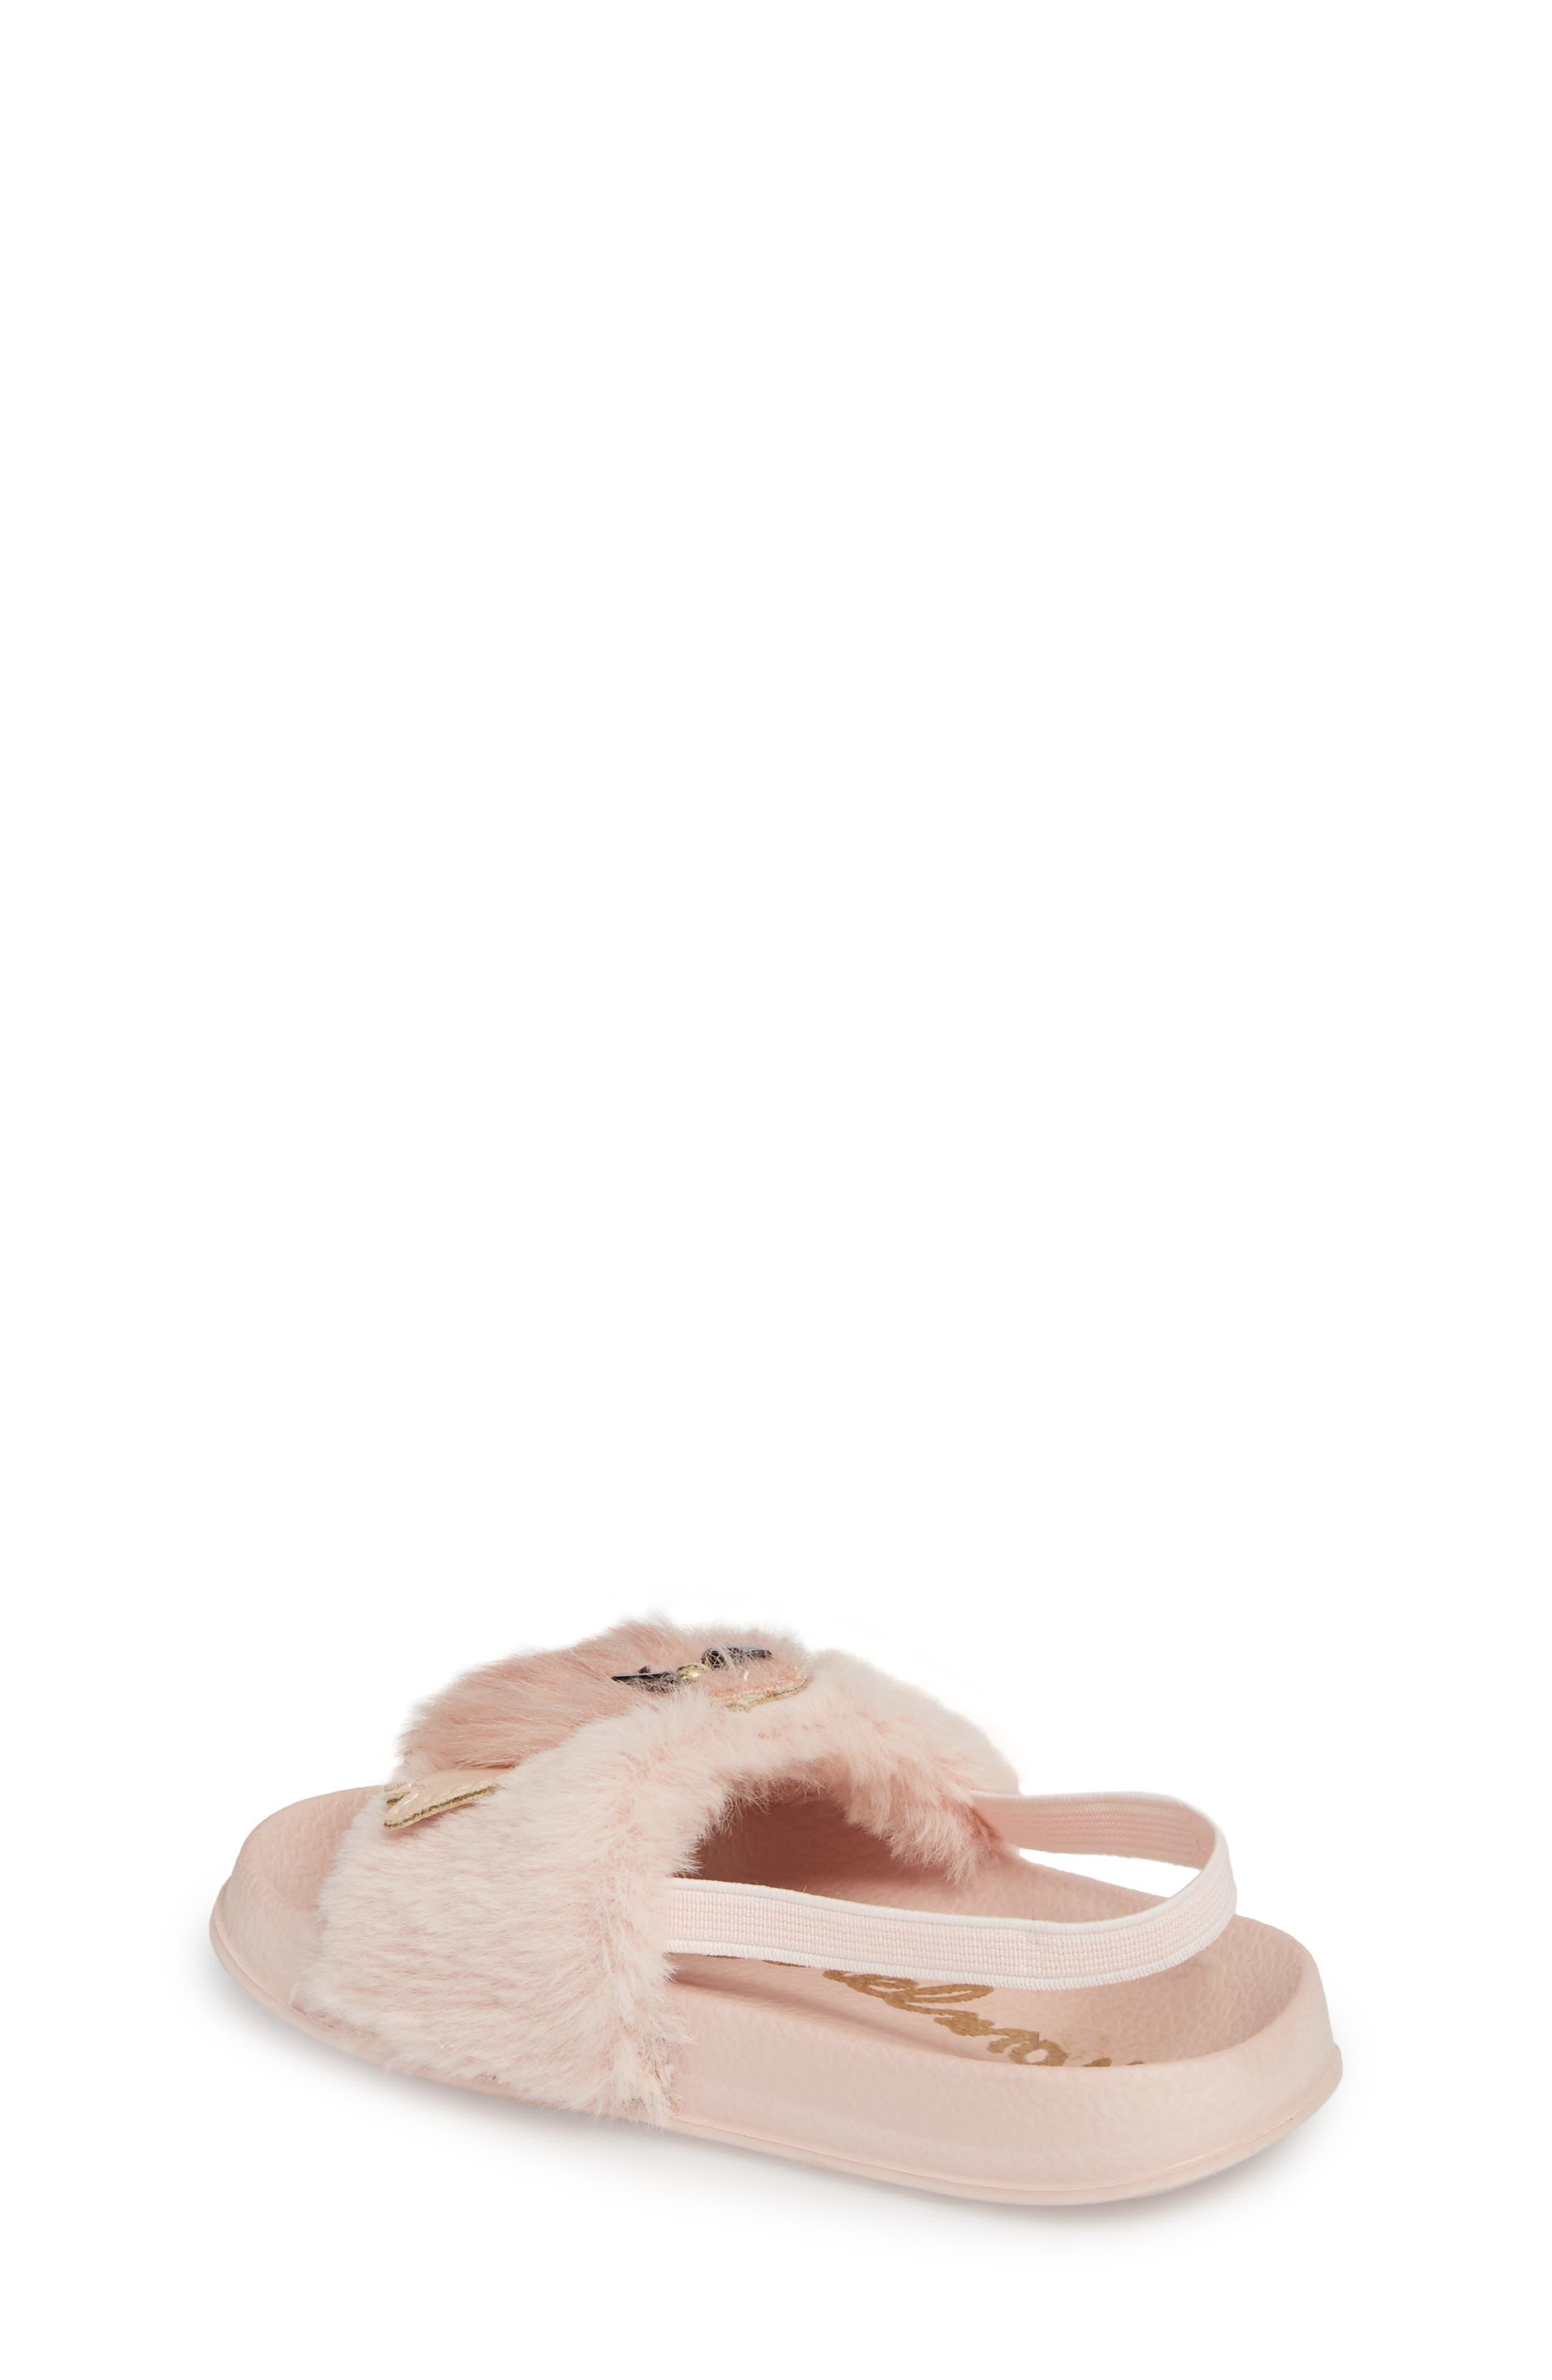 Mackie Faux Fur Sandal,                             Alternate thumbnail 2, color,                             654